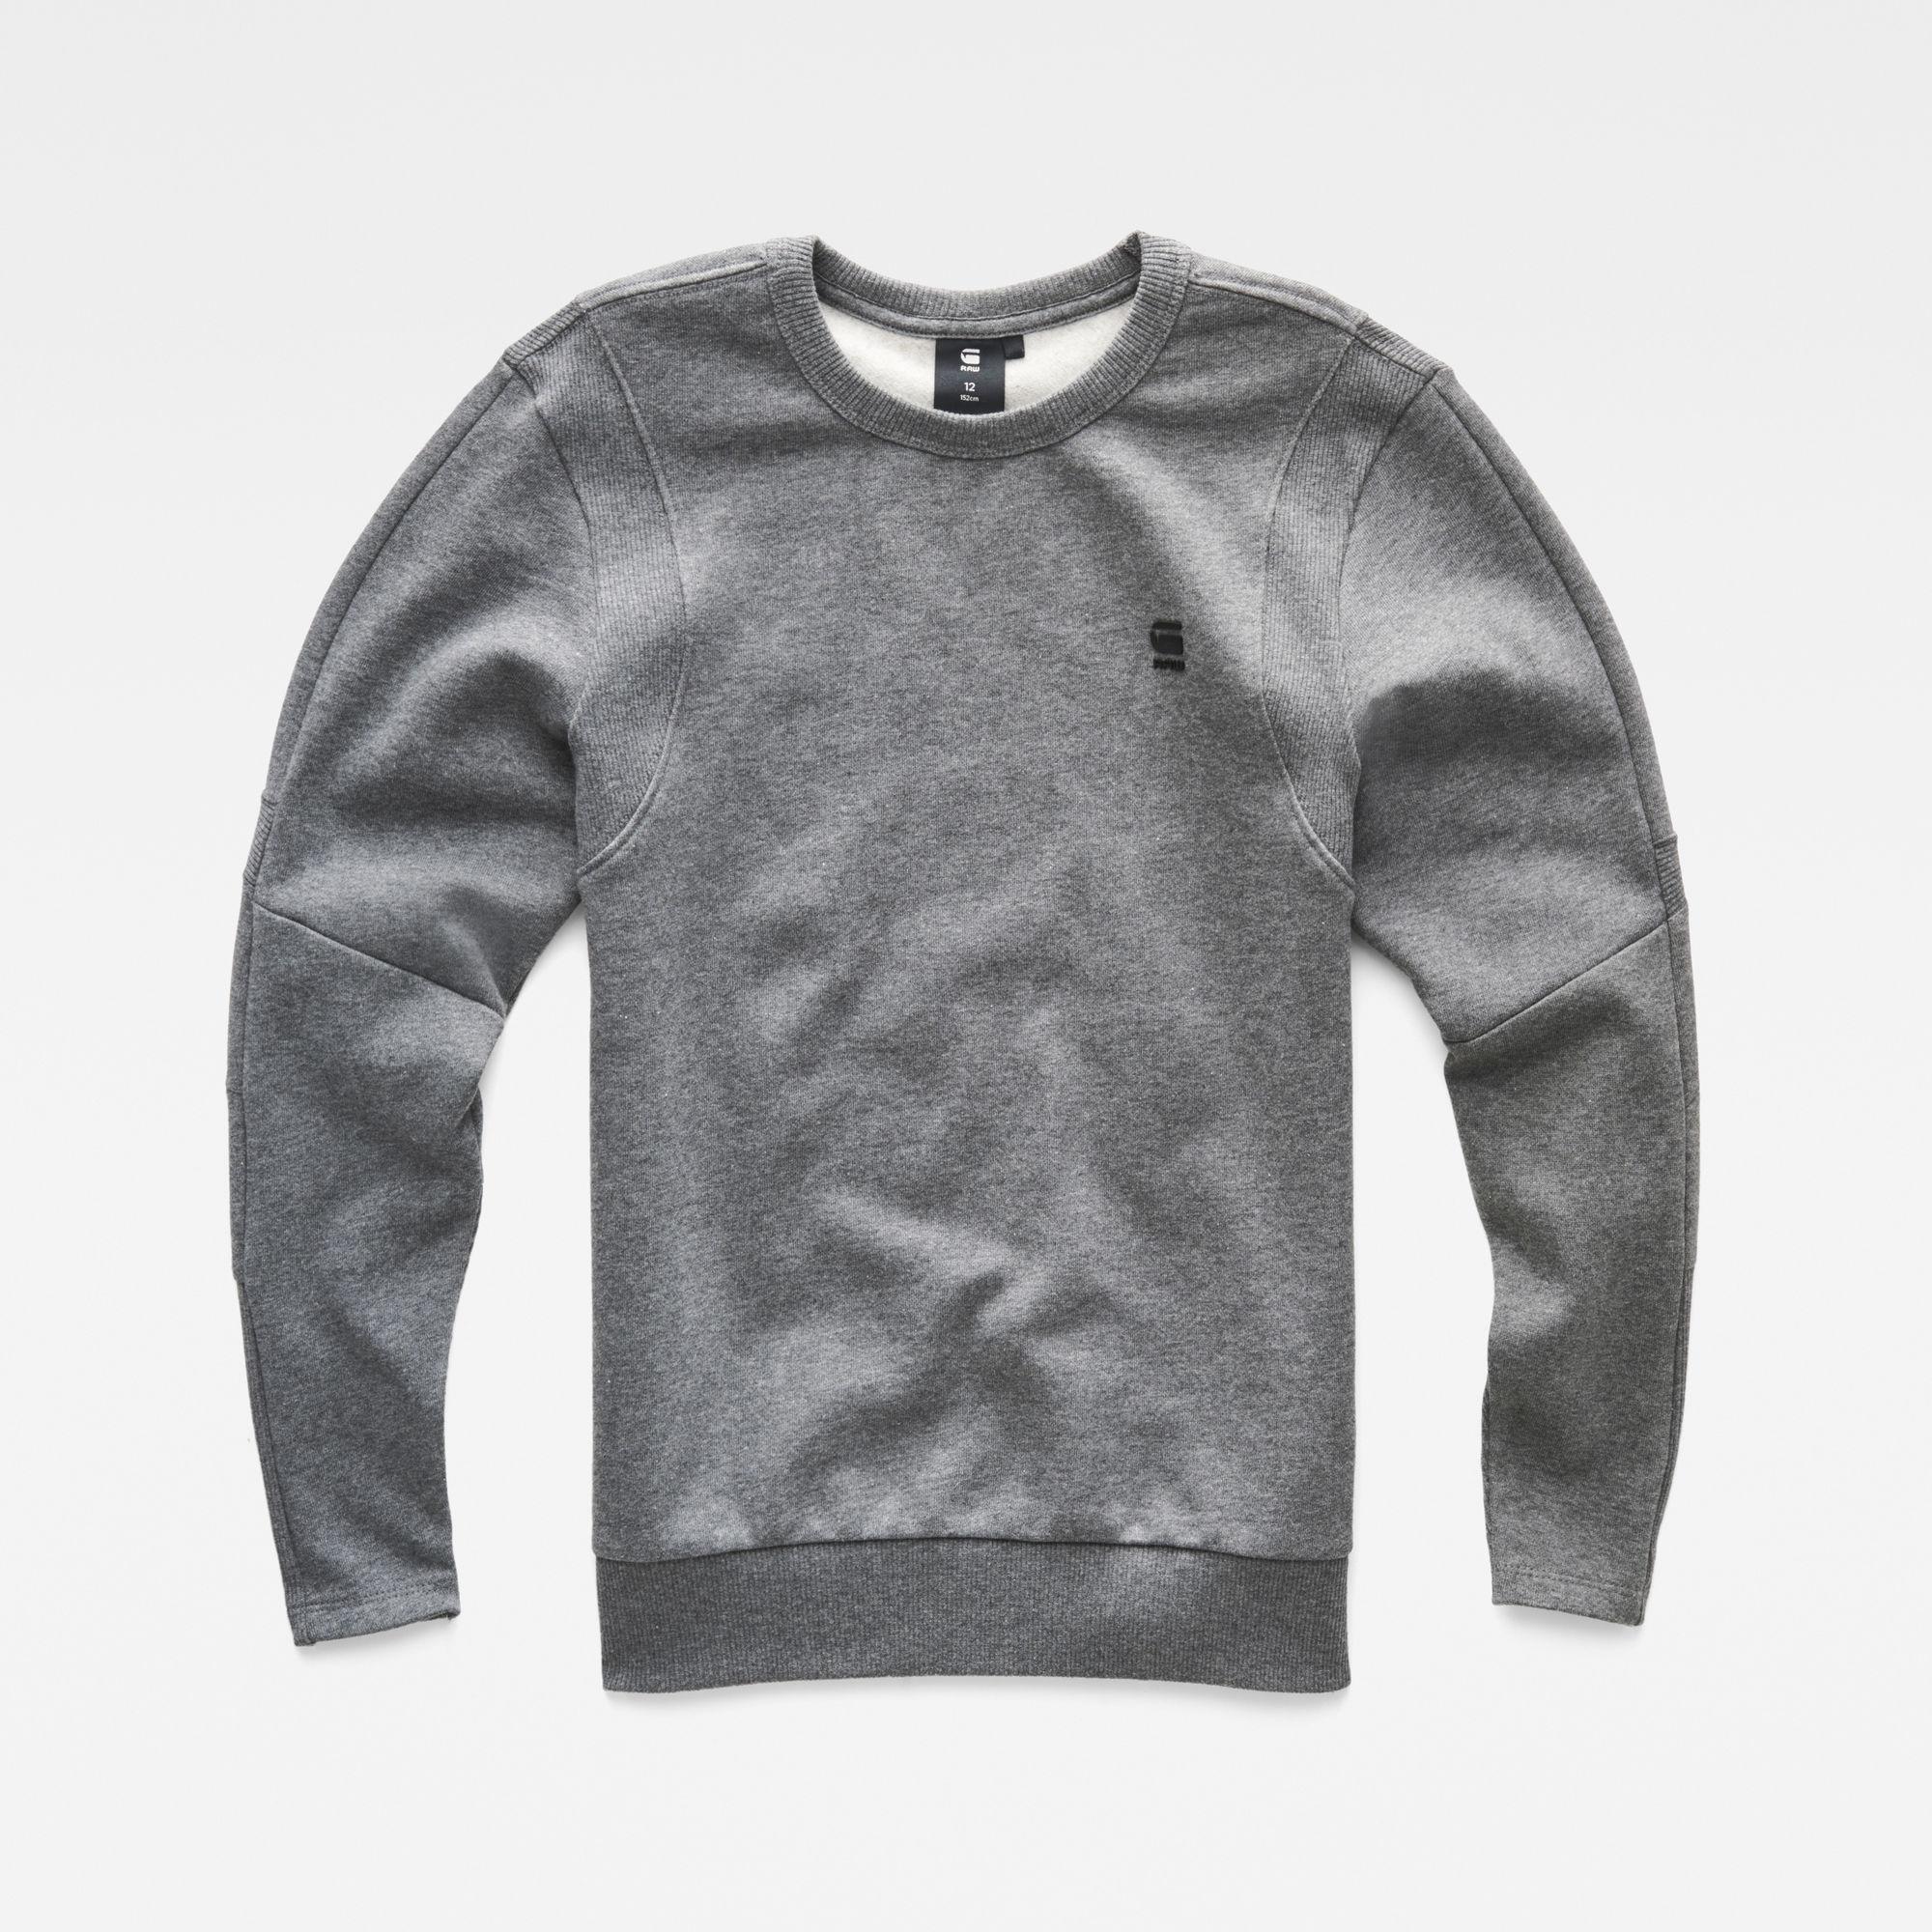 G-Star RAW Jongens Sweater Grijs